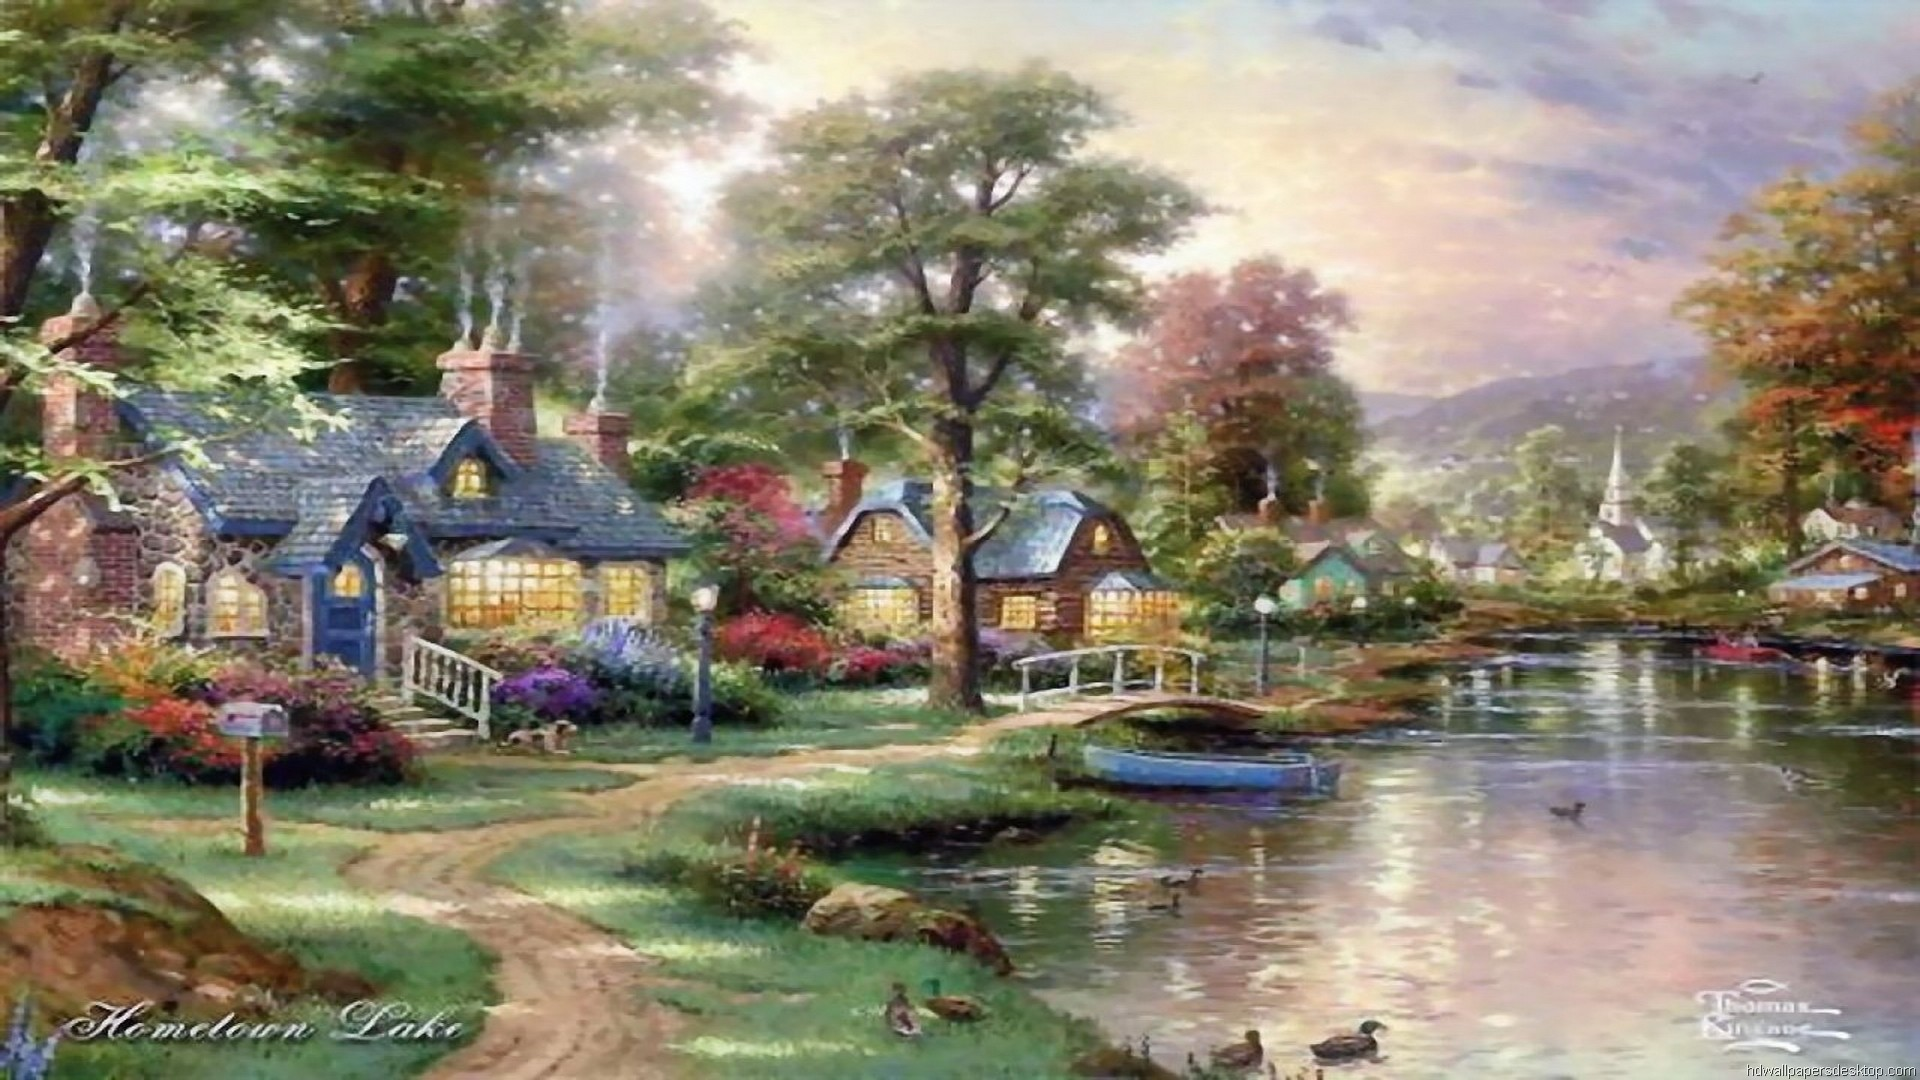 Thomas Kinkade Wallpaper, Paintings, Art, HD, Desktop, Thomas Kinkade 3 |  Chainimage